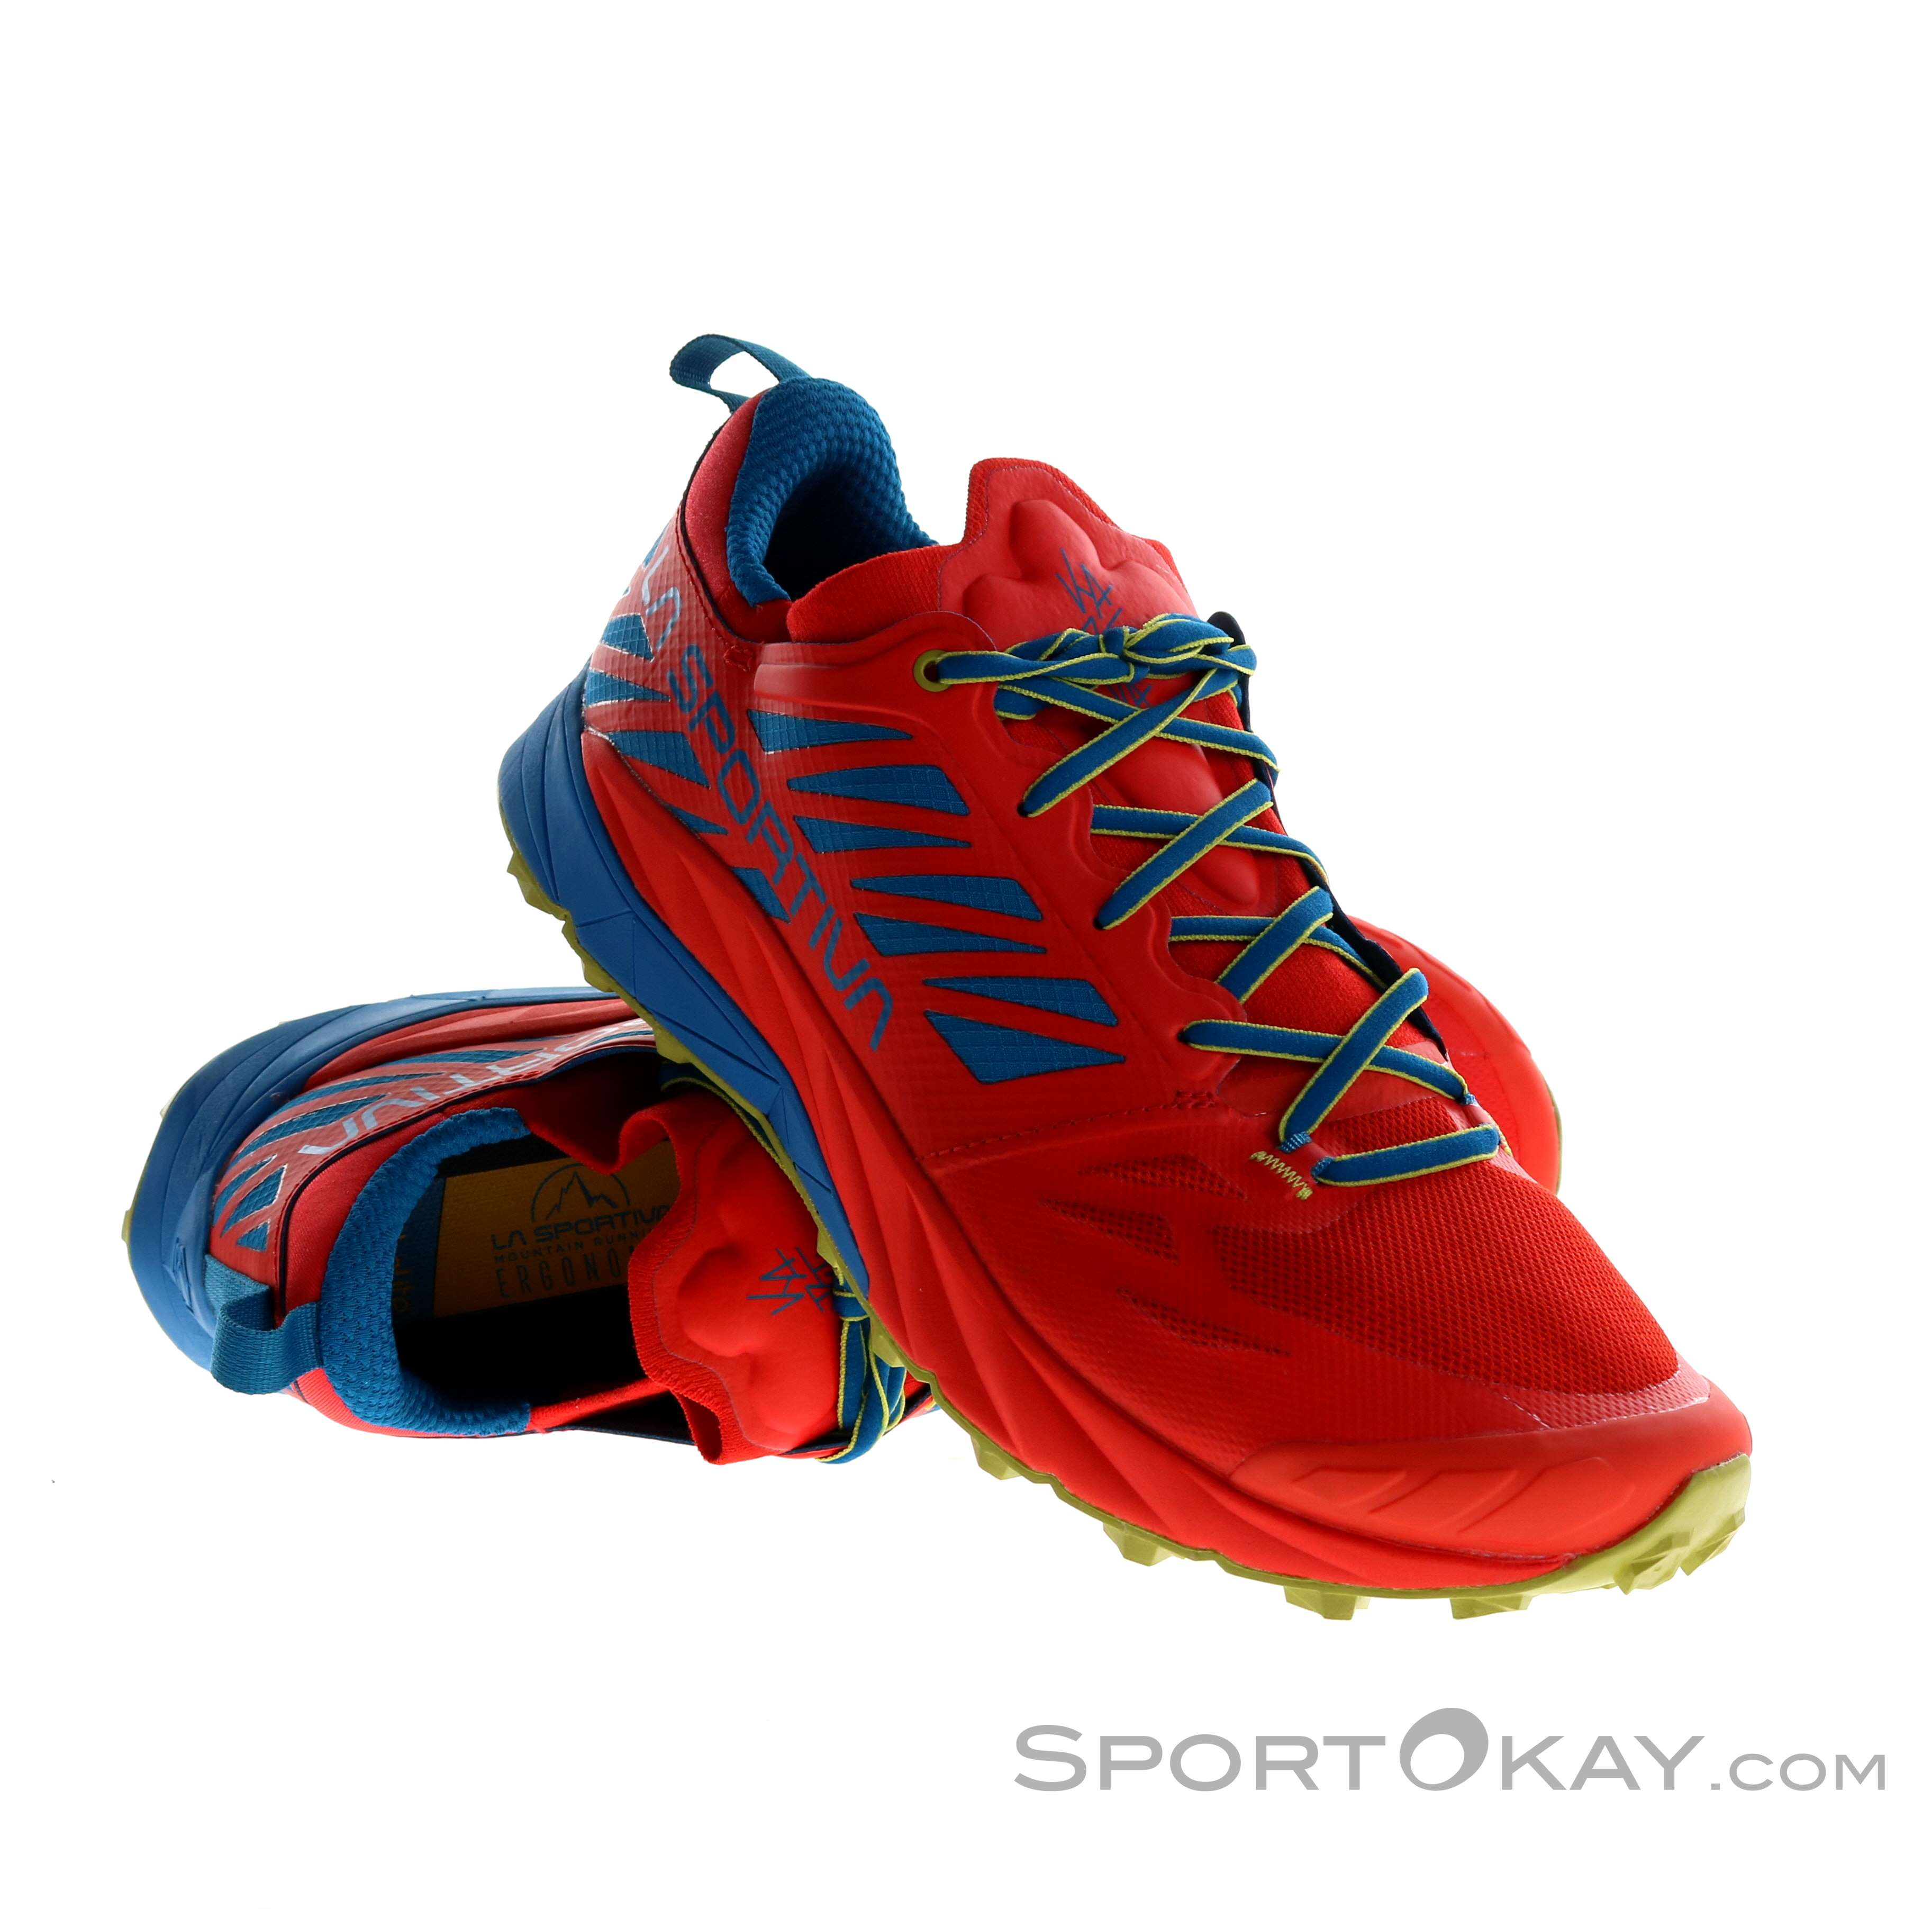 La Sportiva La Sportiva Kaptiva Mens Trail Running Shoes